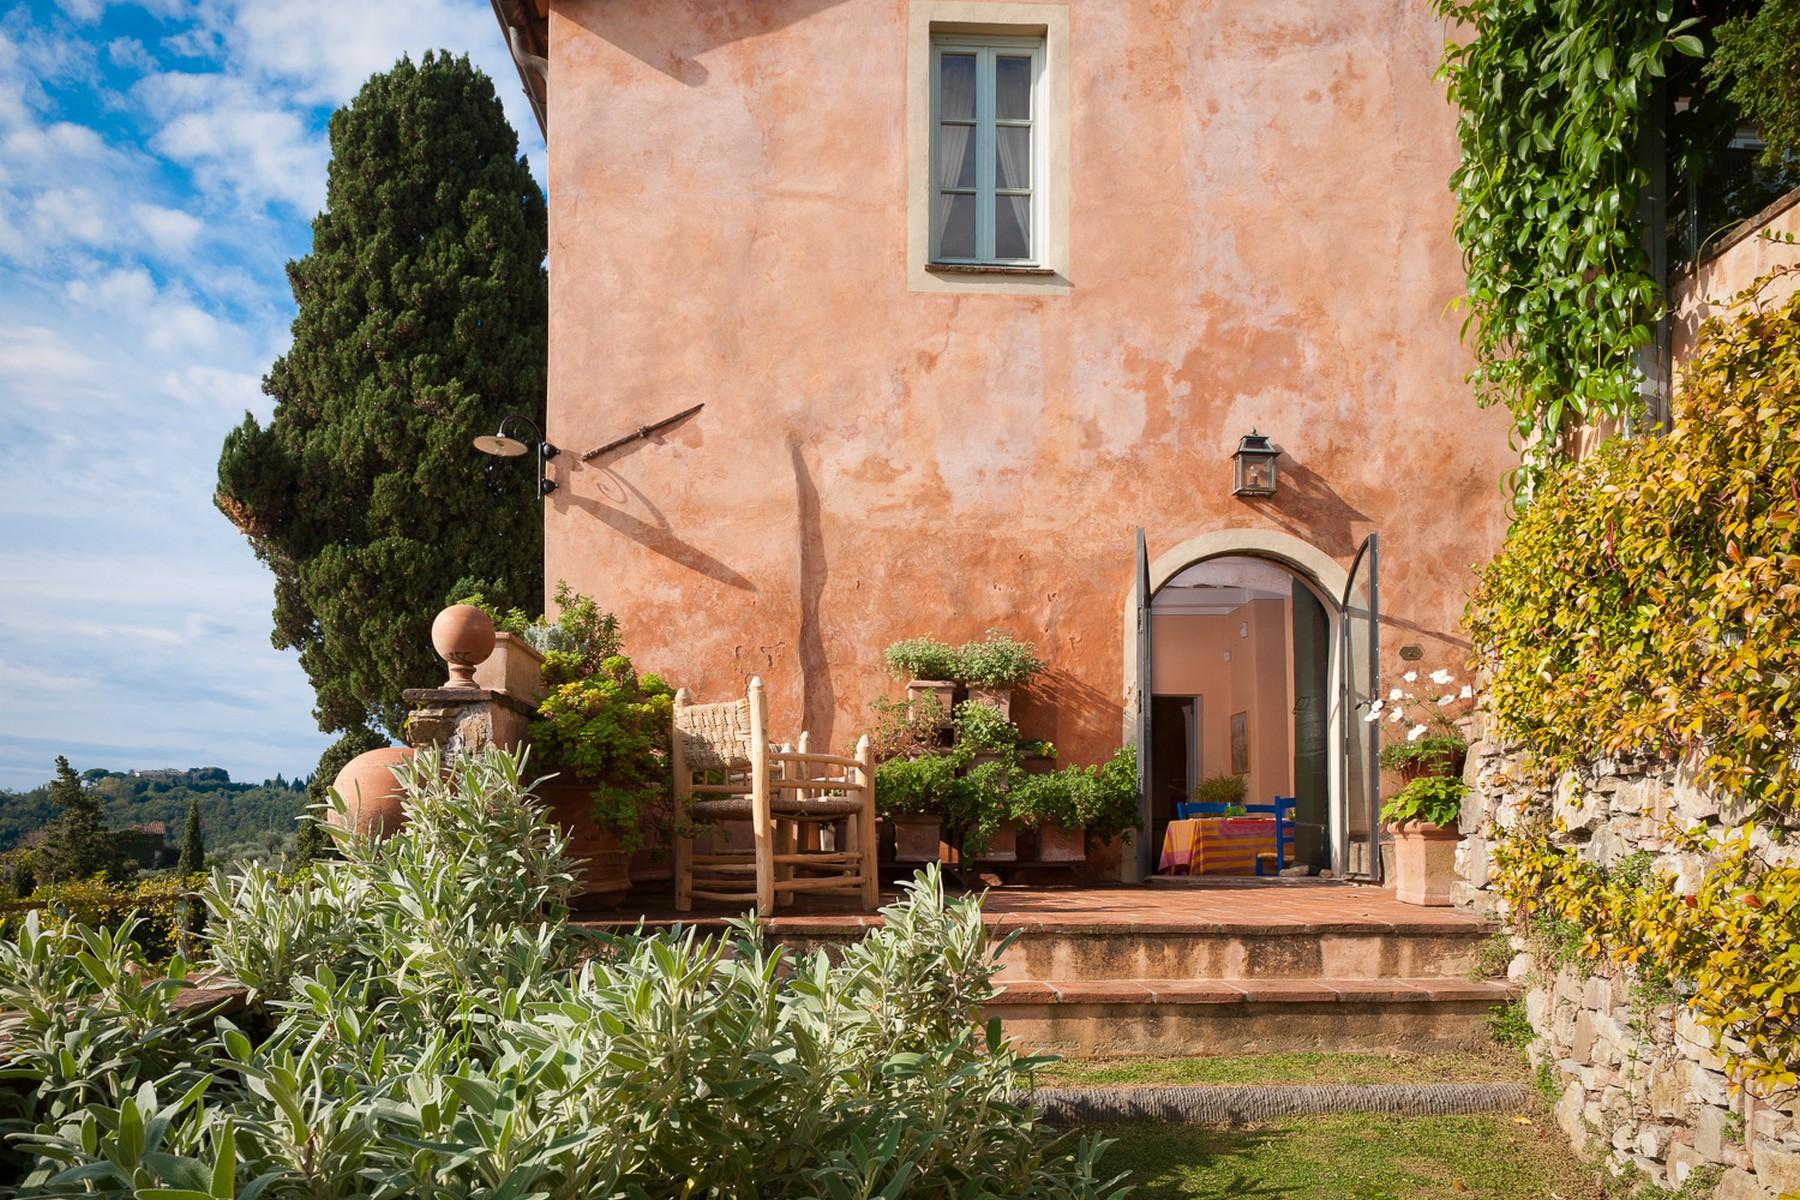 Rustico in Vendita a Lucca: 5 locali, 540 mq - Foto 4